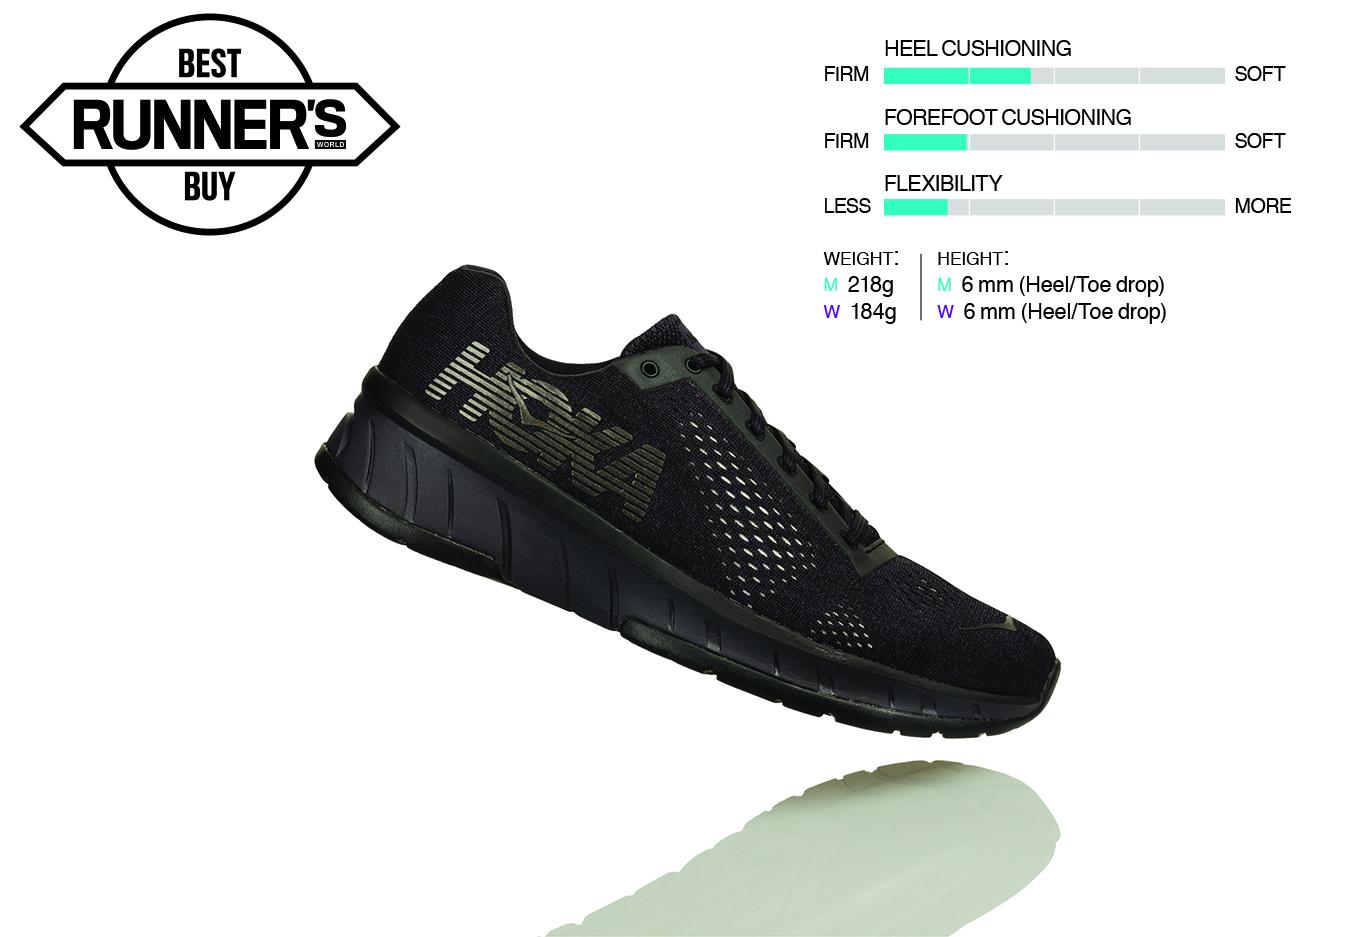 Best running shoes 2018 - Hoka One One Cavu